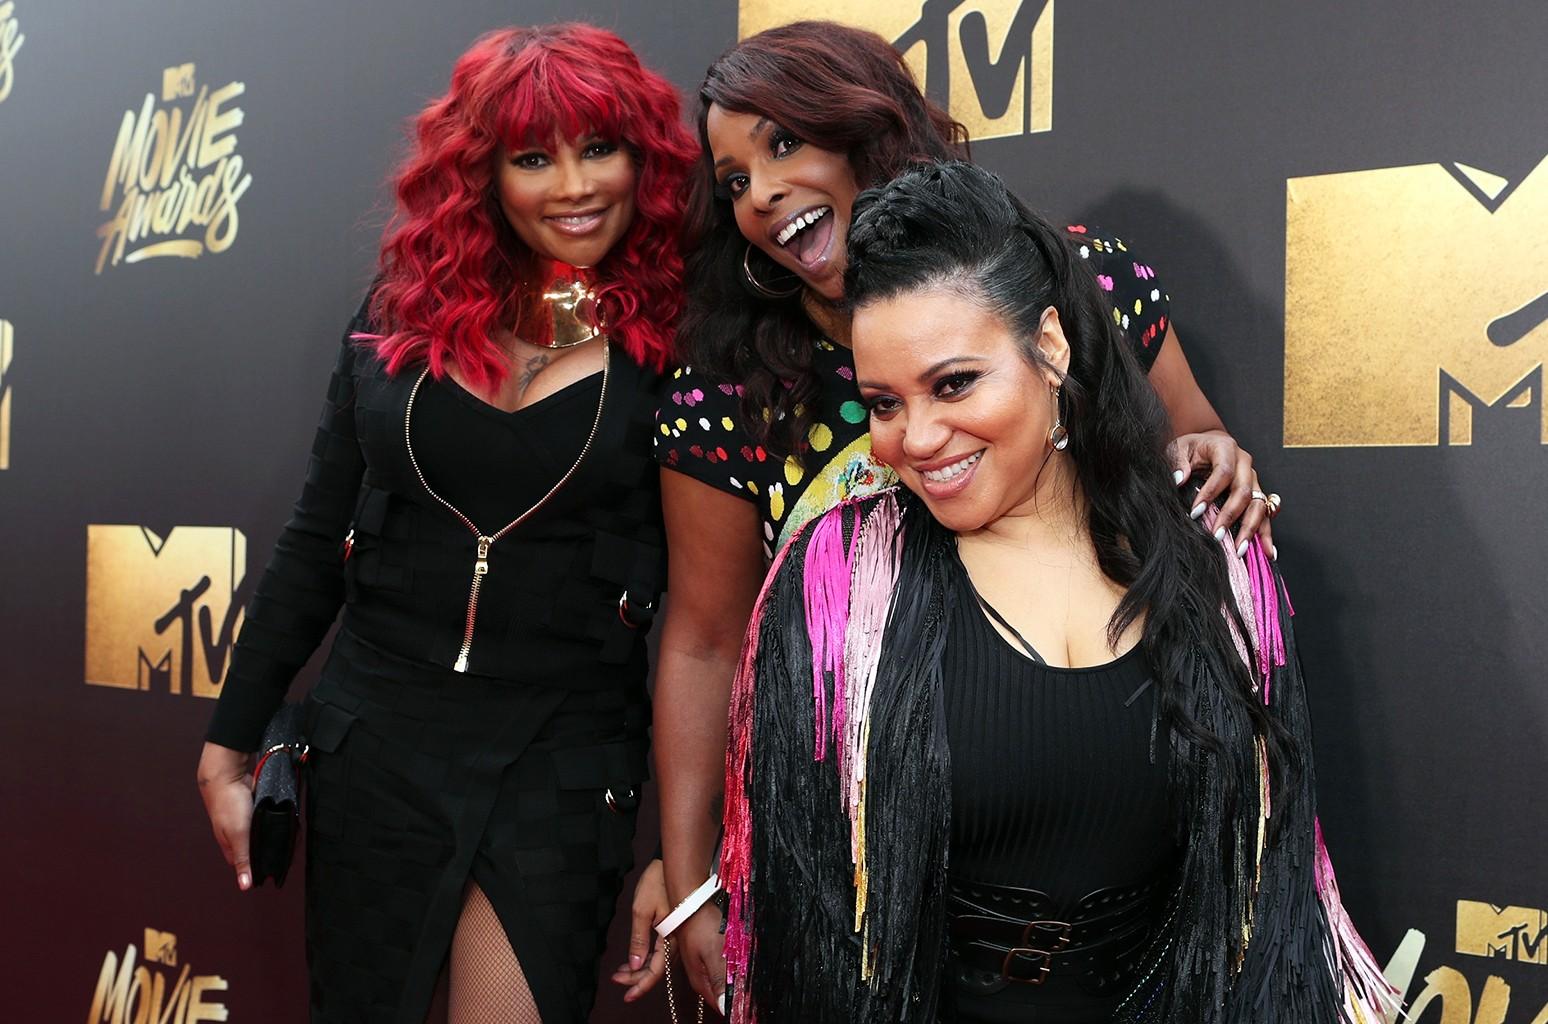 Salt-N-Pepa attend the 2016 MTV Movie Awards